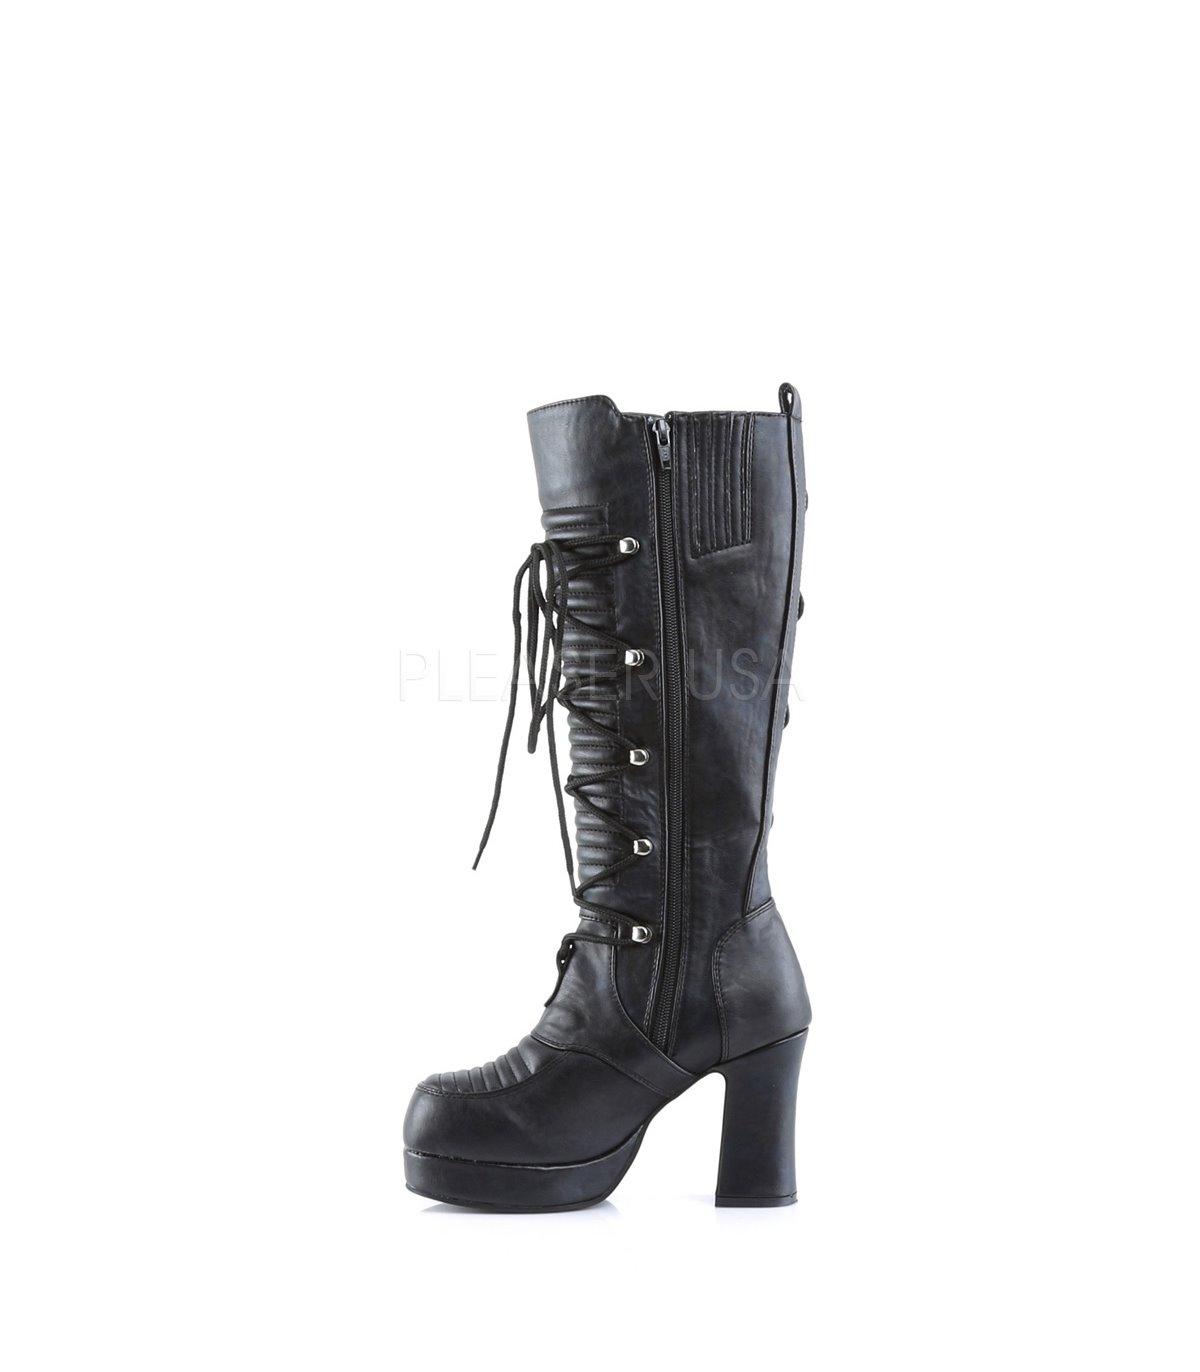 809829a1513fb Plateau Stiefel Demonia gothika-200 online kaufen